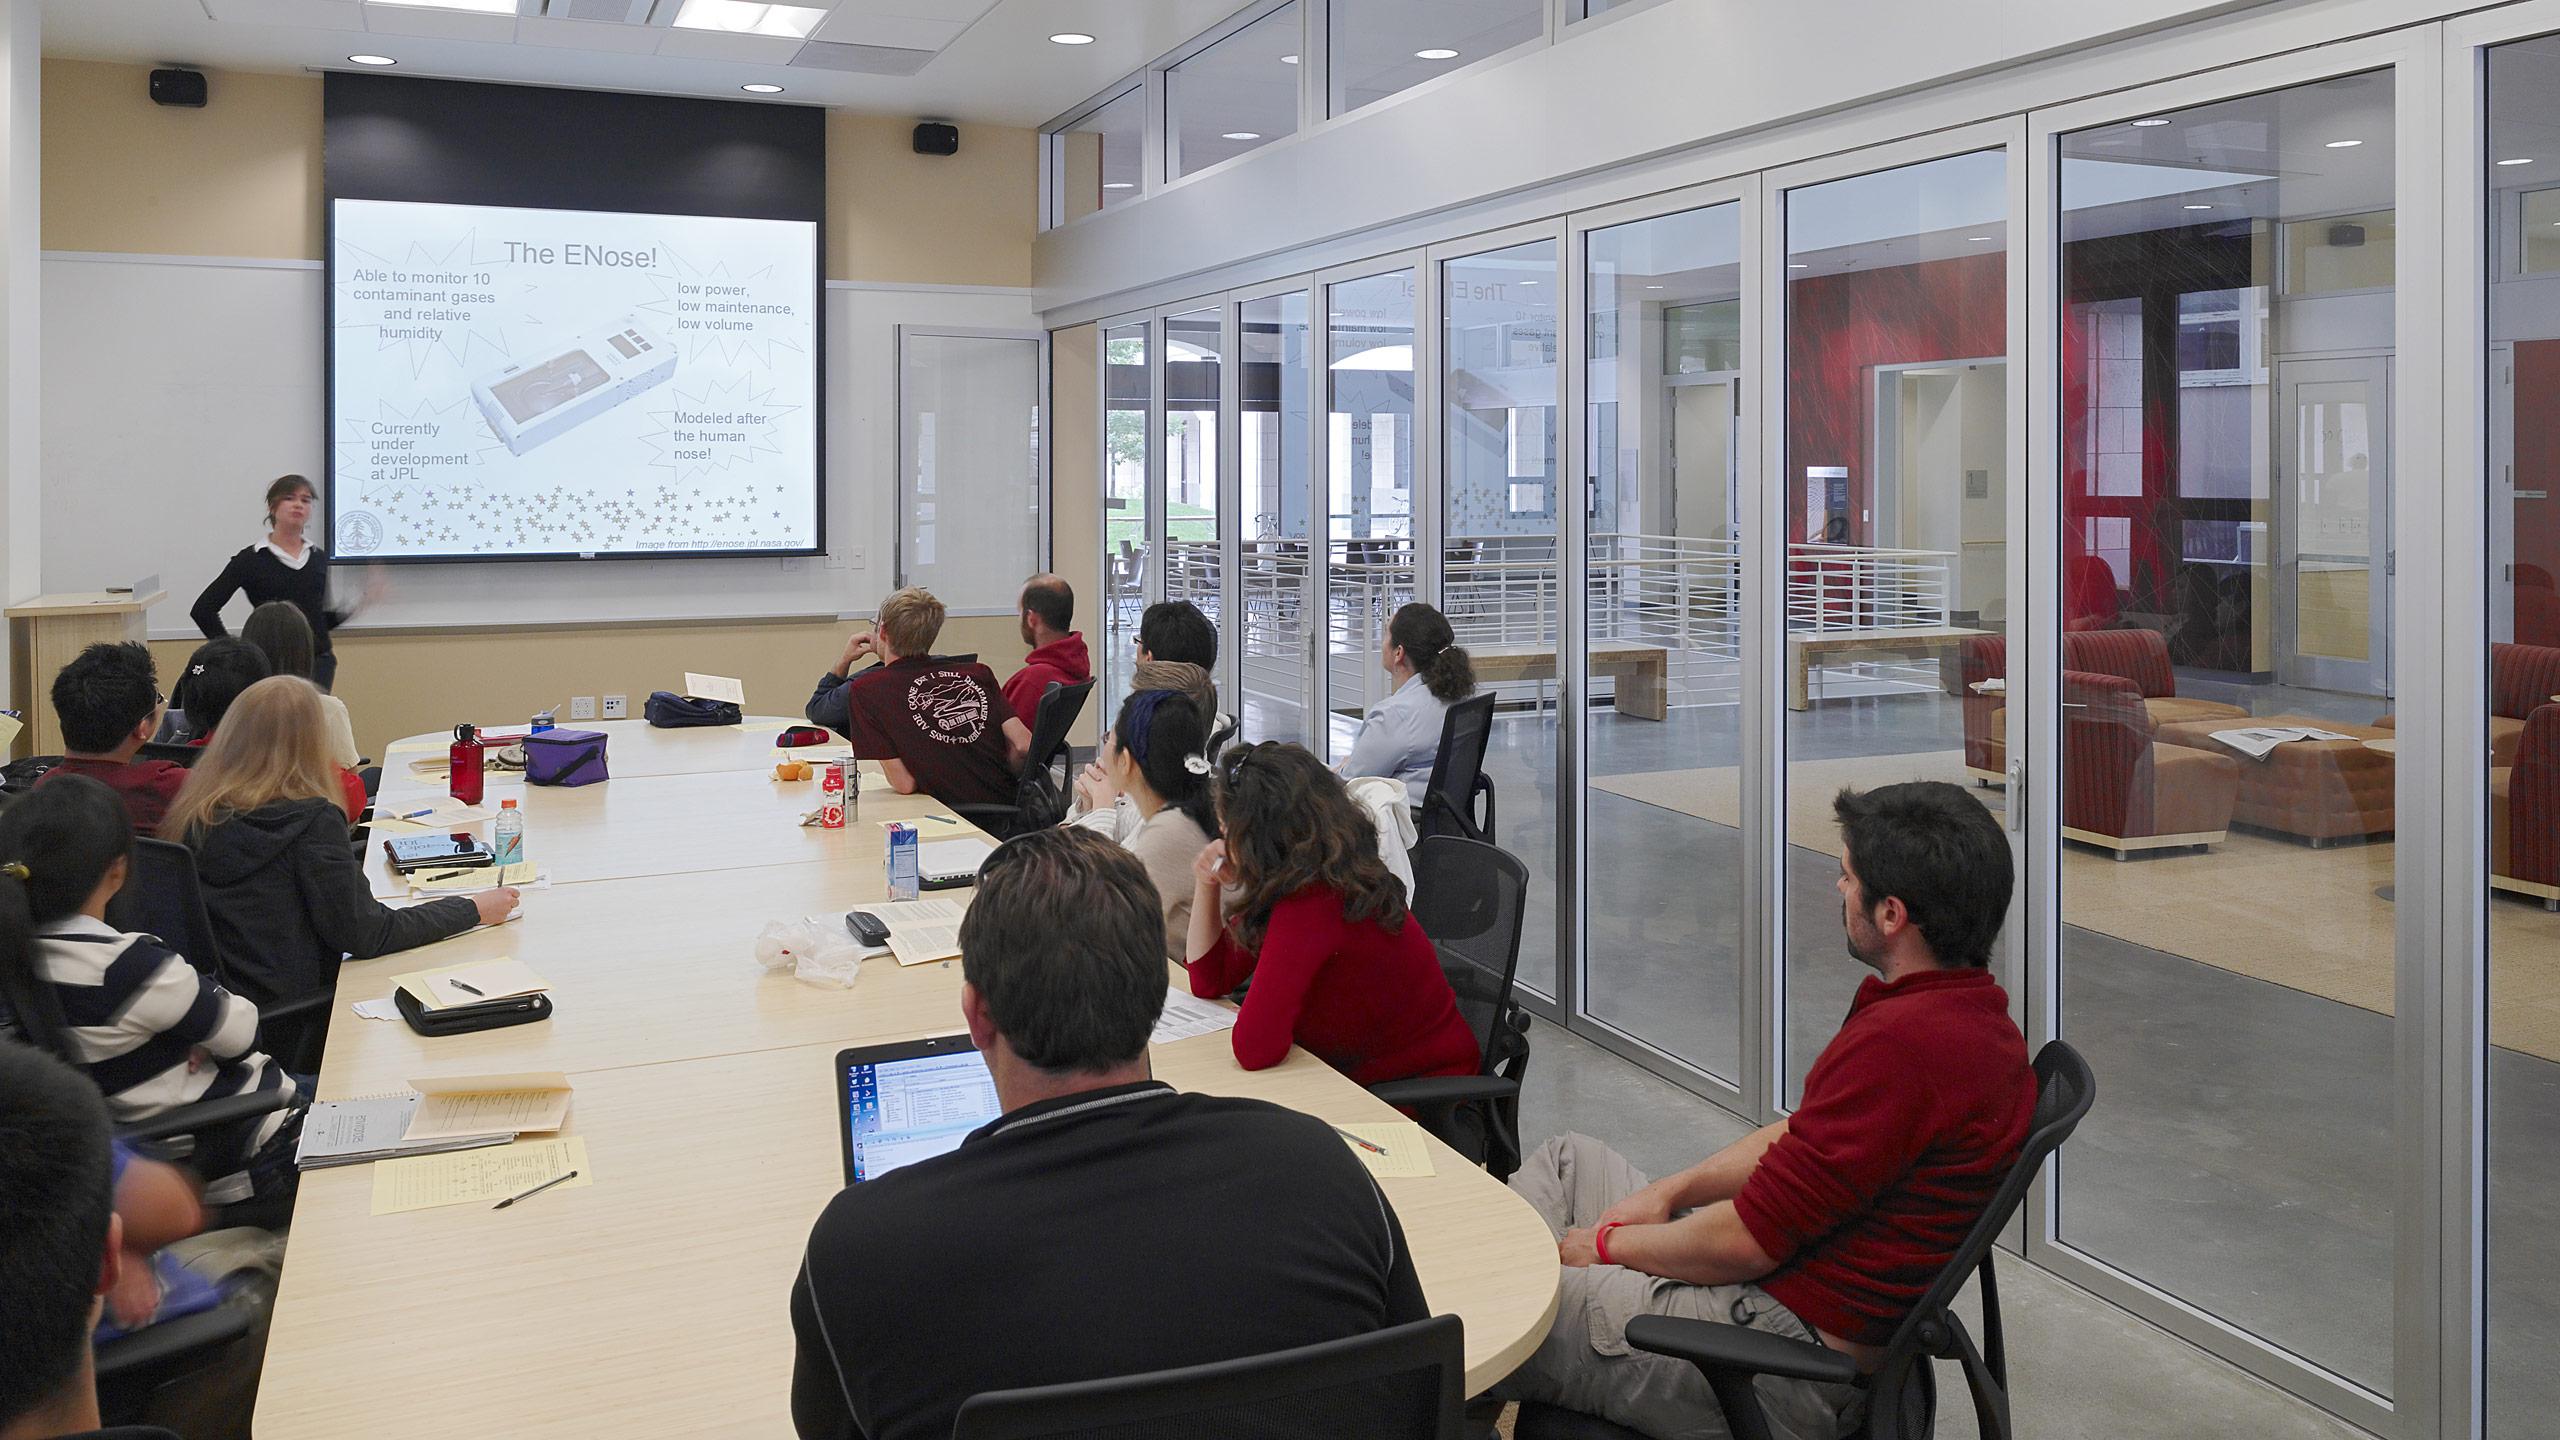 Yang and Yamazaki Environment and Energy Building – Stanford University / image 7